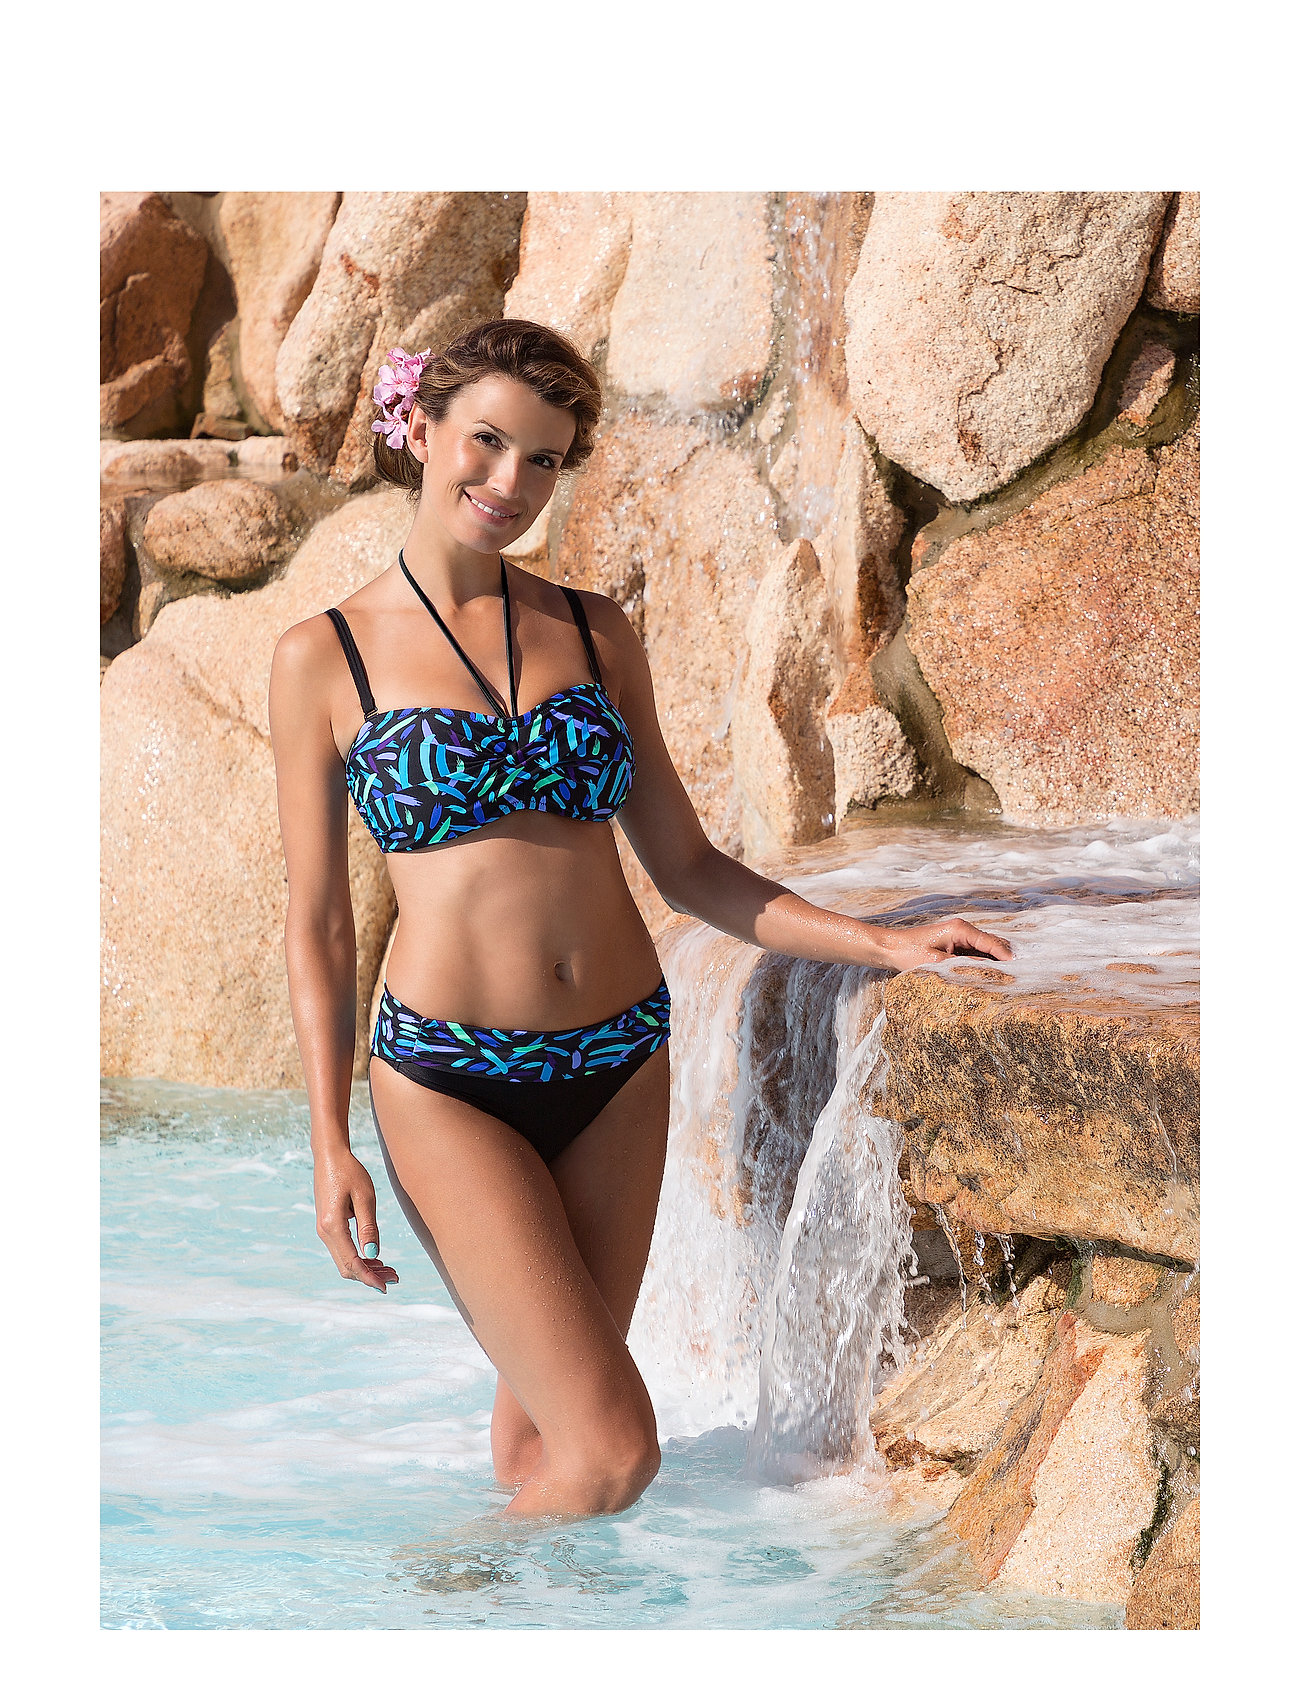 Wiki - Swim Tai de luxe - bas de maillot de bain - w587/san paulo